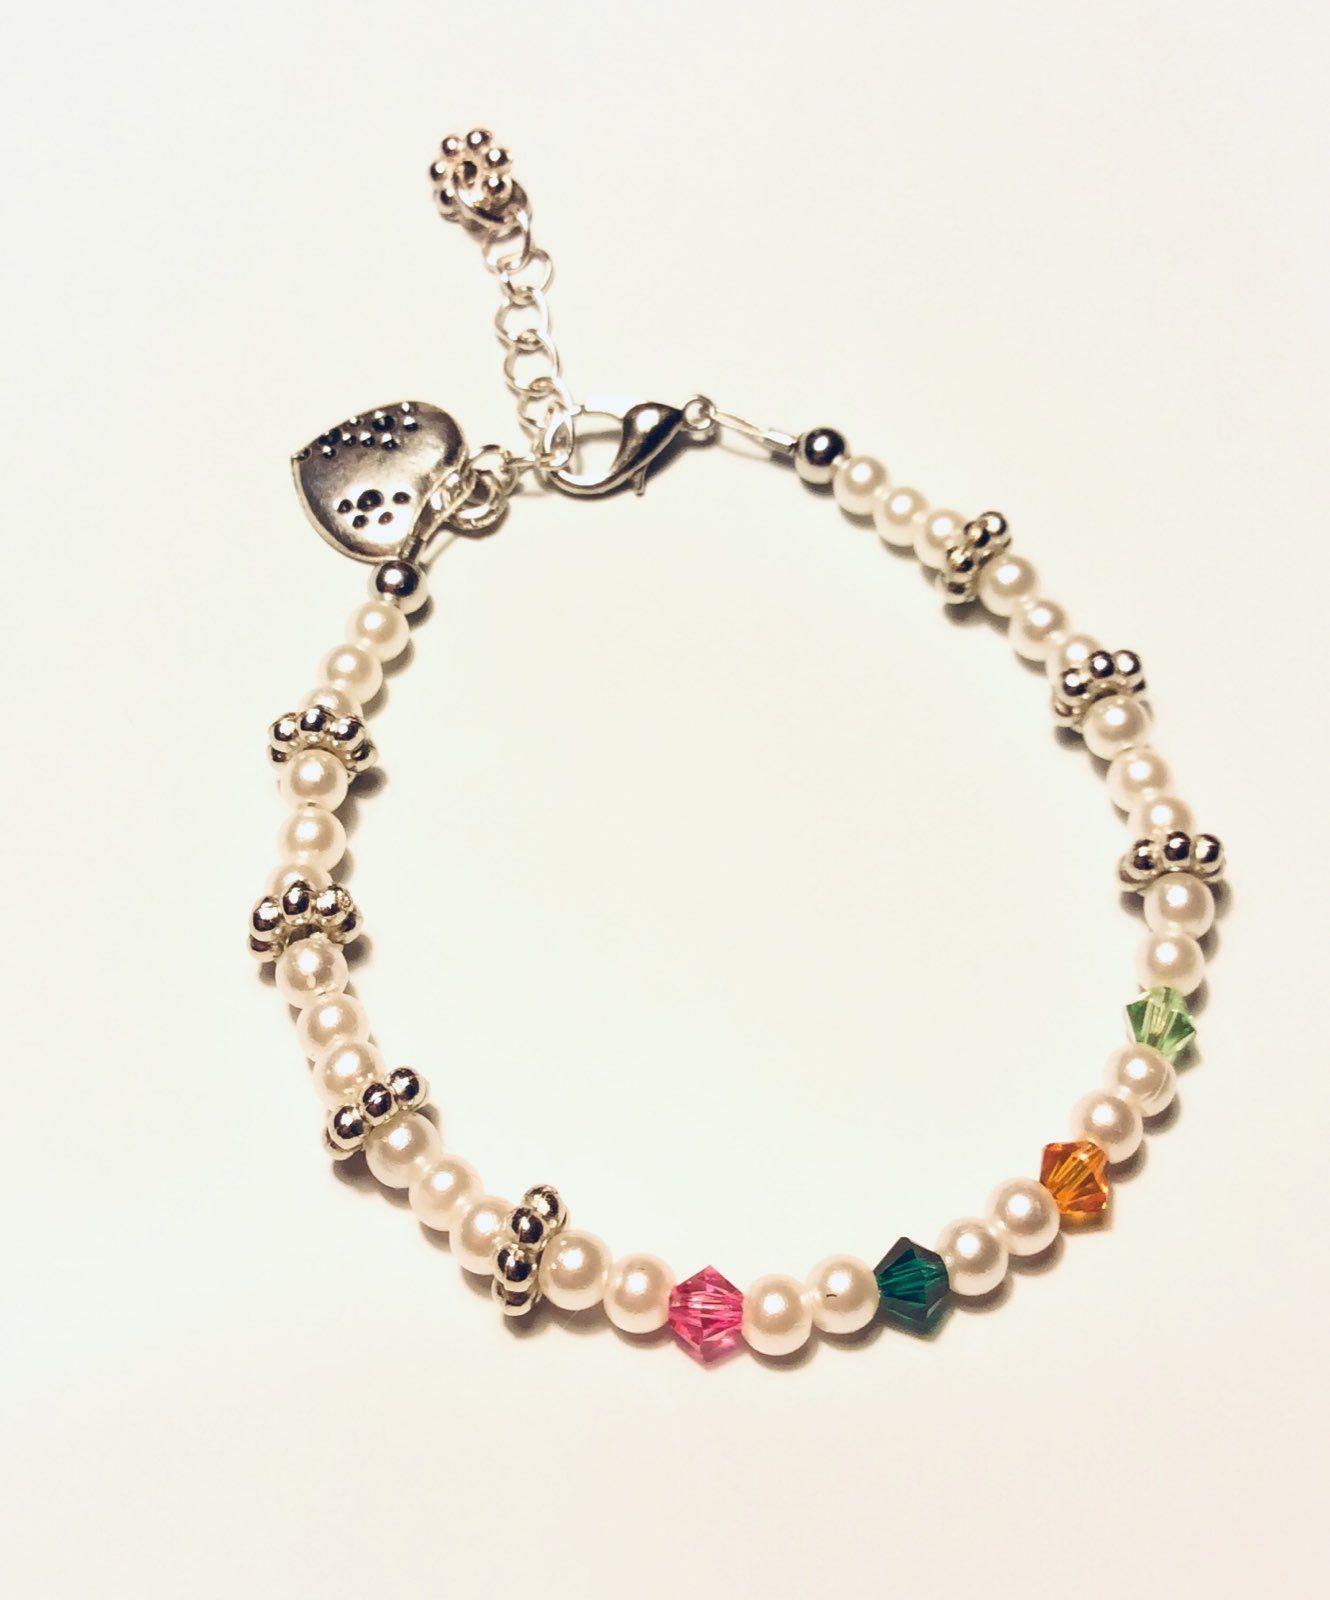 Cool Item Birthstone Bracelet Handmade